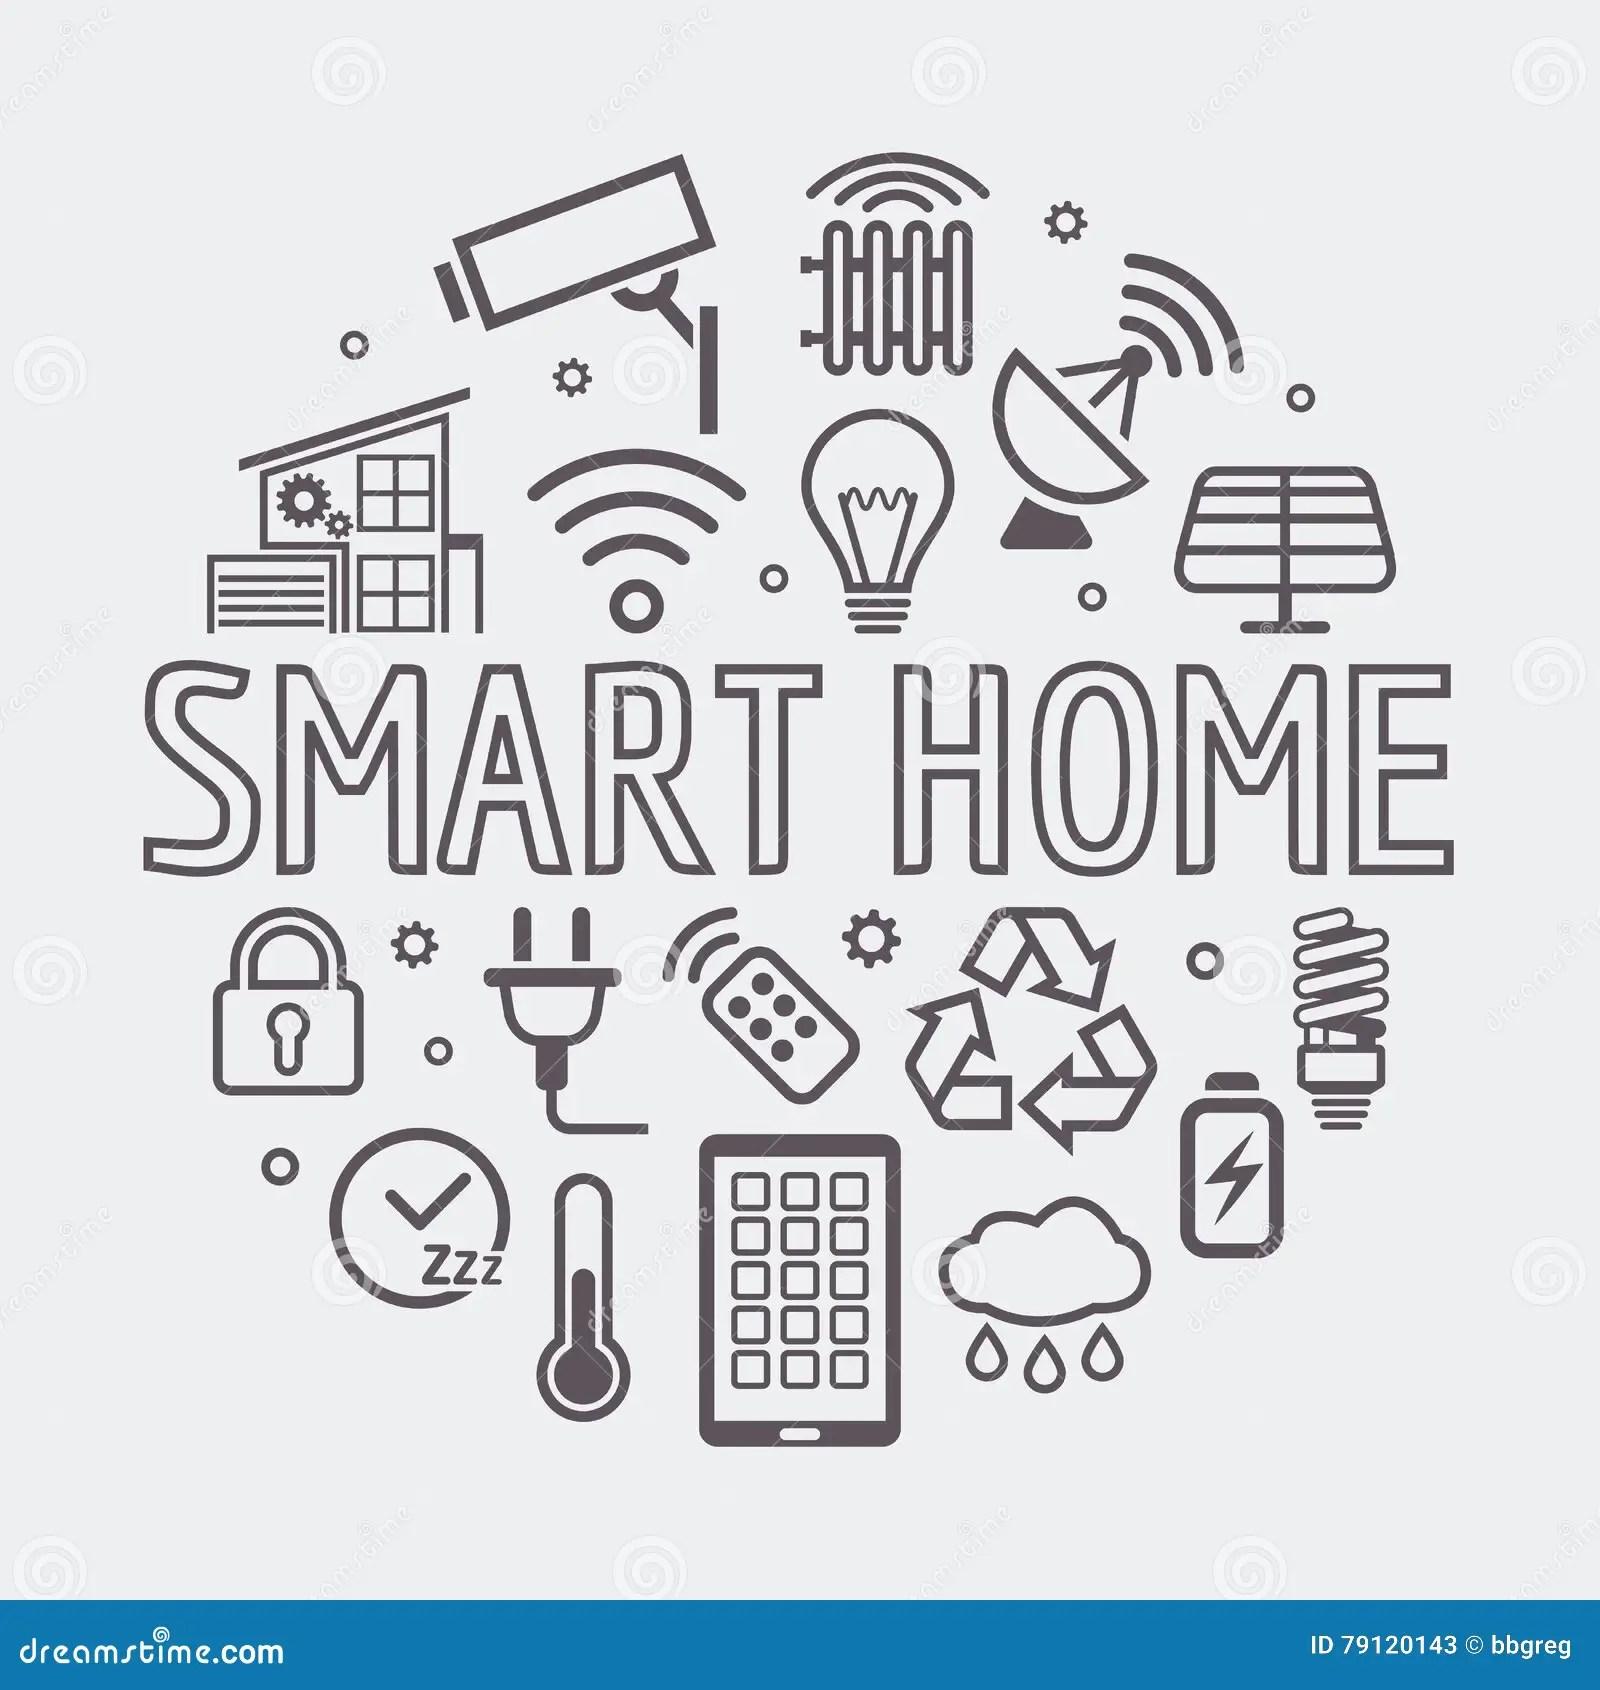 Modern Smart Home Round Illustration, Vector Symbol Made